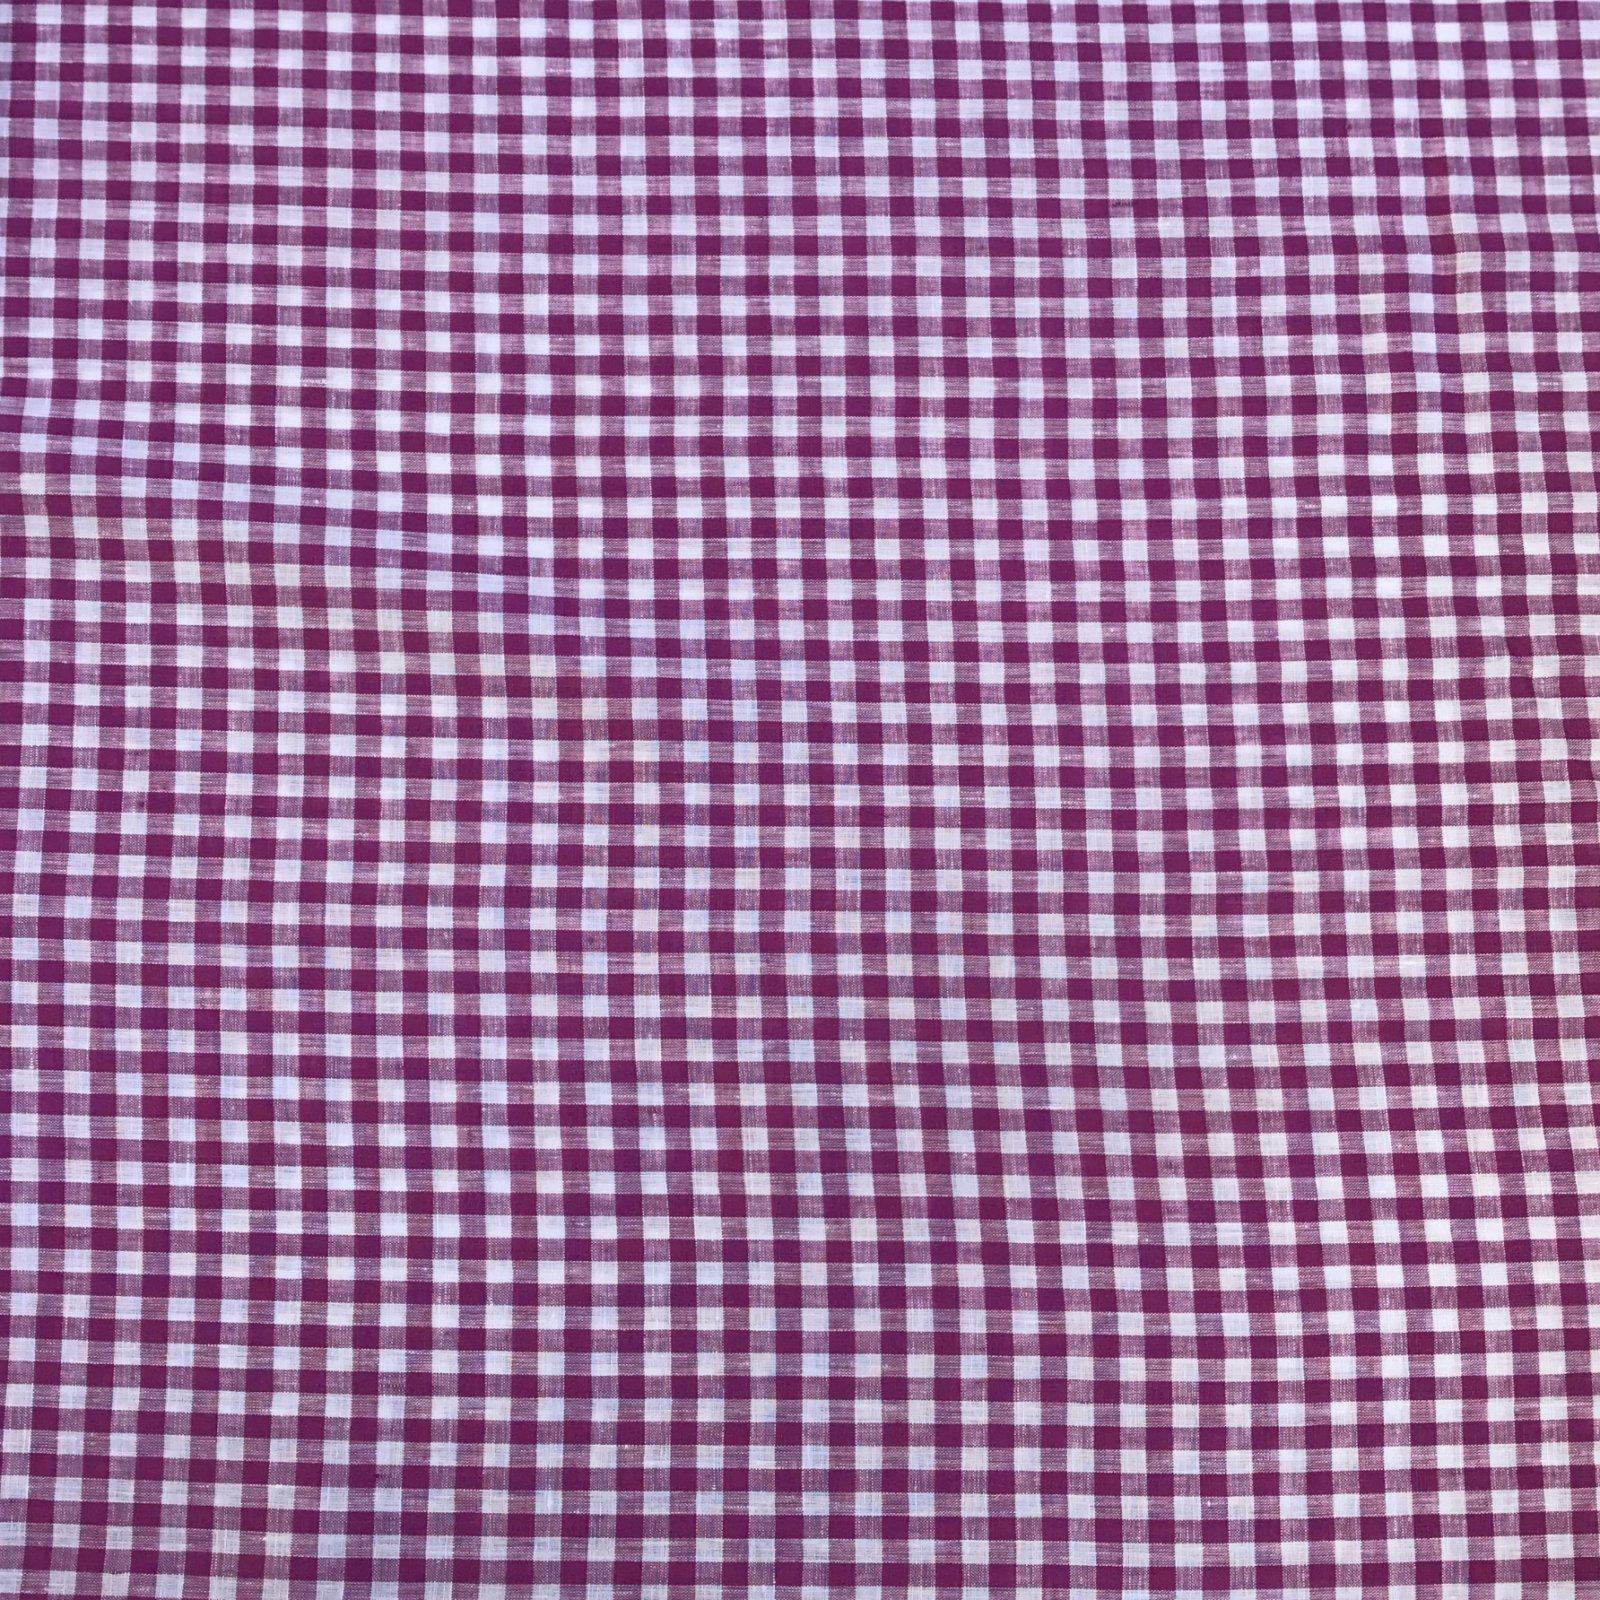 Linen Gingham Check - Grape